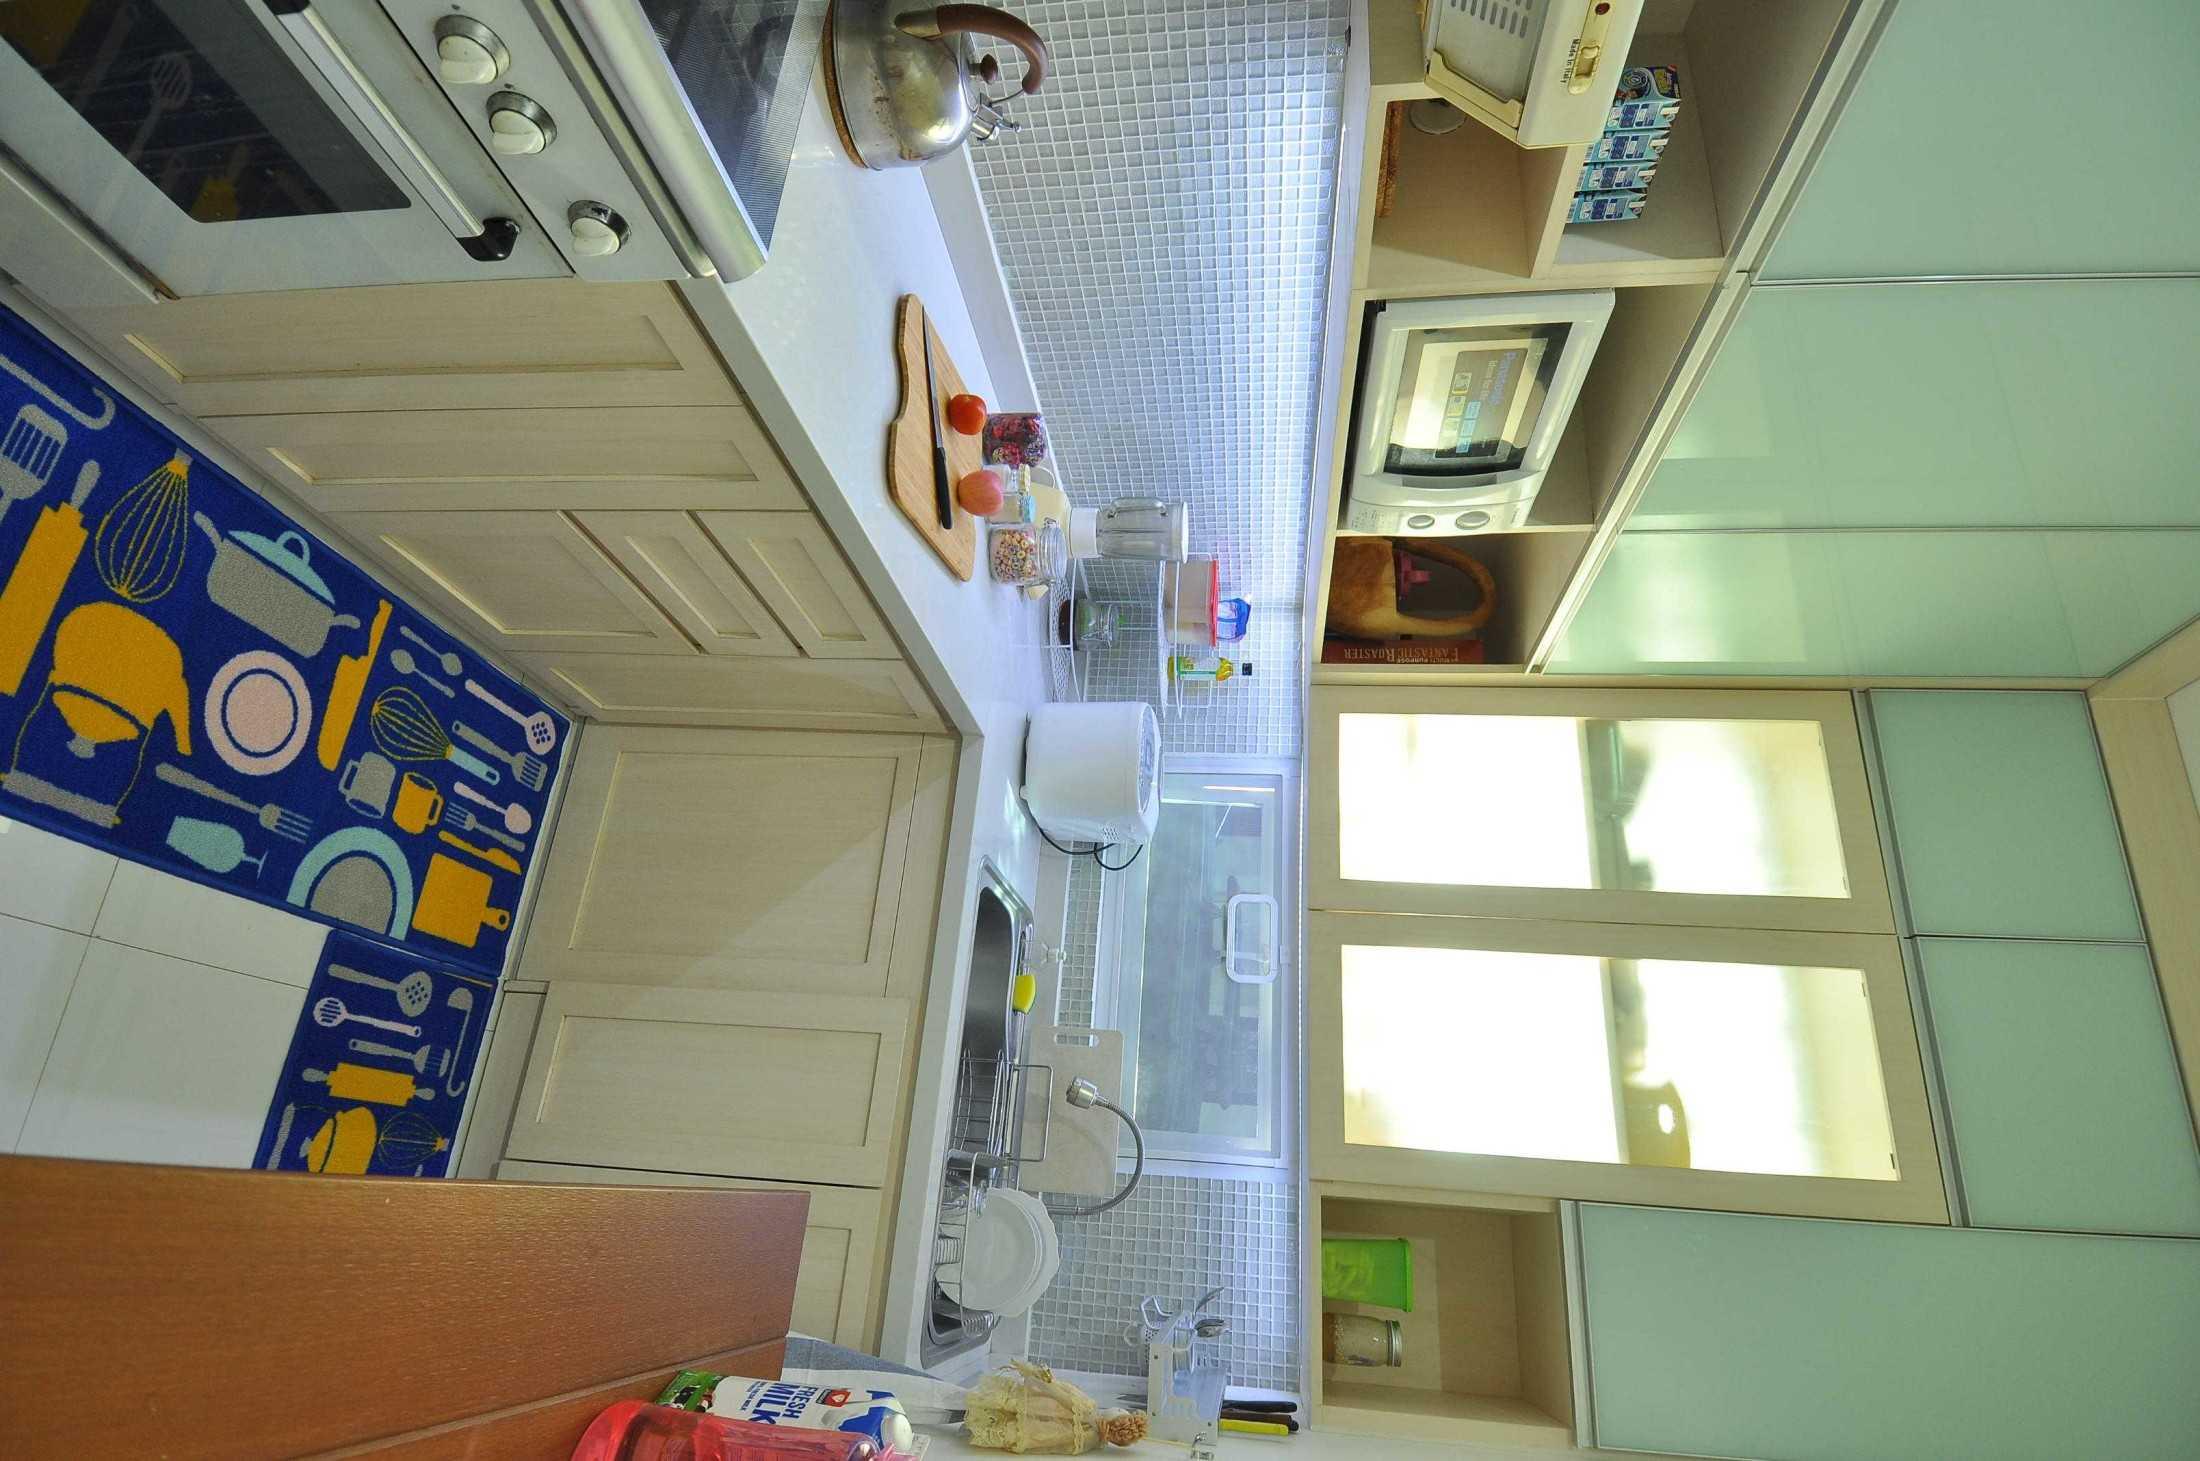 Arsigram Home Interior Built In Jln Alteri Bintaro No.78 Rt 007/001, Bintaro Jaya, Kec. Pd. Aren, Kota Tangerang Selatan, Banten, Indonesia Jln Alteri Bintaro No.78 Rt 007/001, Bintaro Jaya, Kec. Pd. Aren, Kota Tangerang Selatan, Banten, Indonesia Arsigram-Home-Interior-Built-In  82750